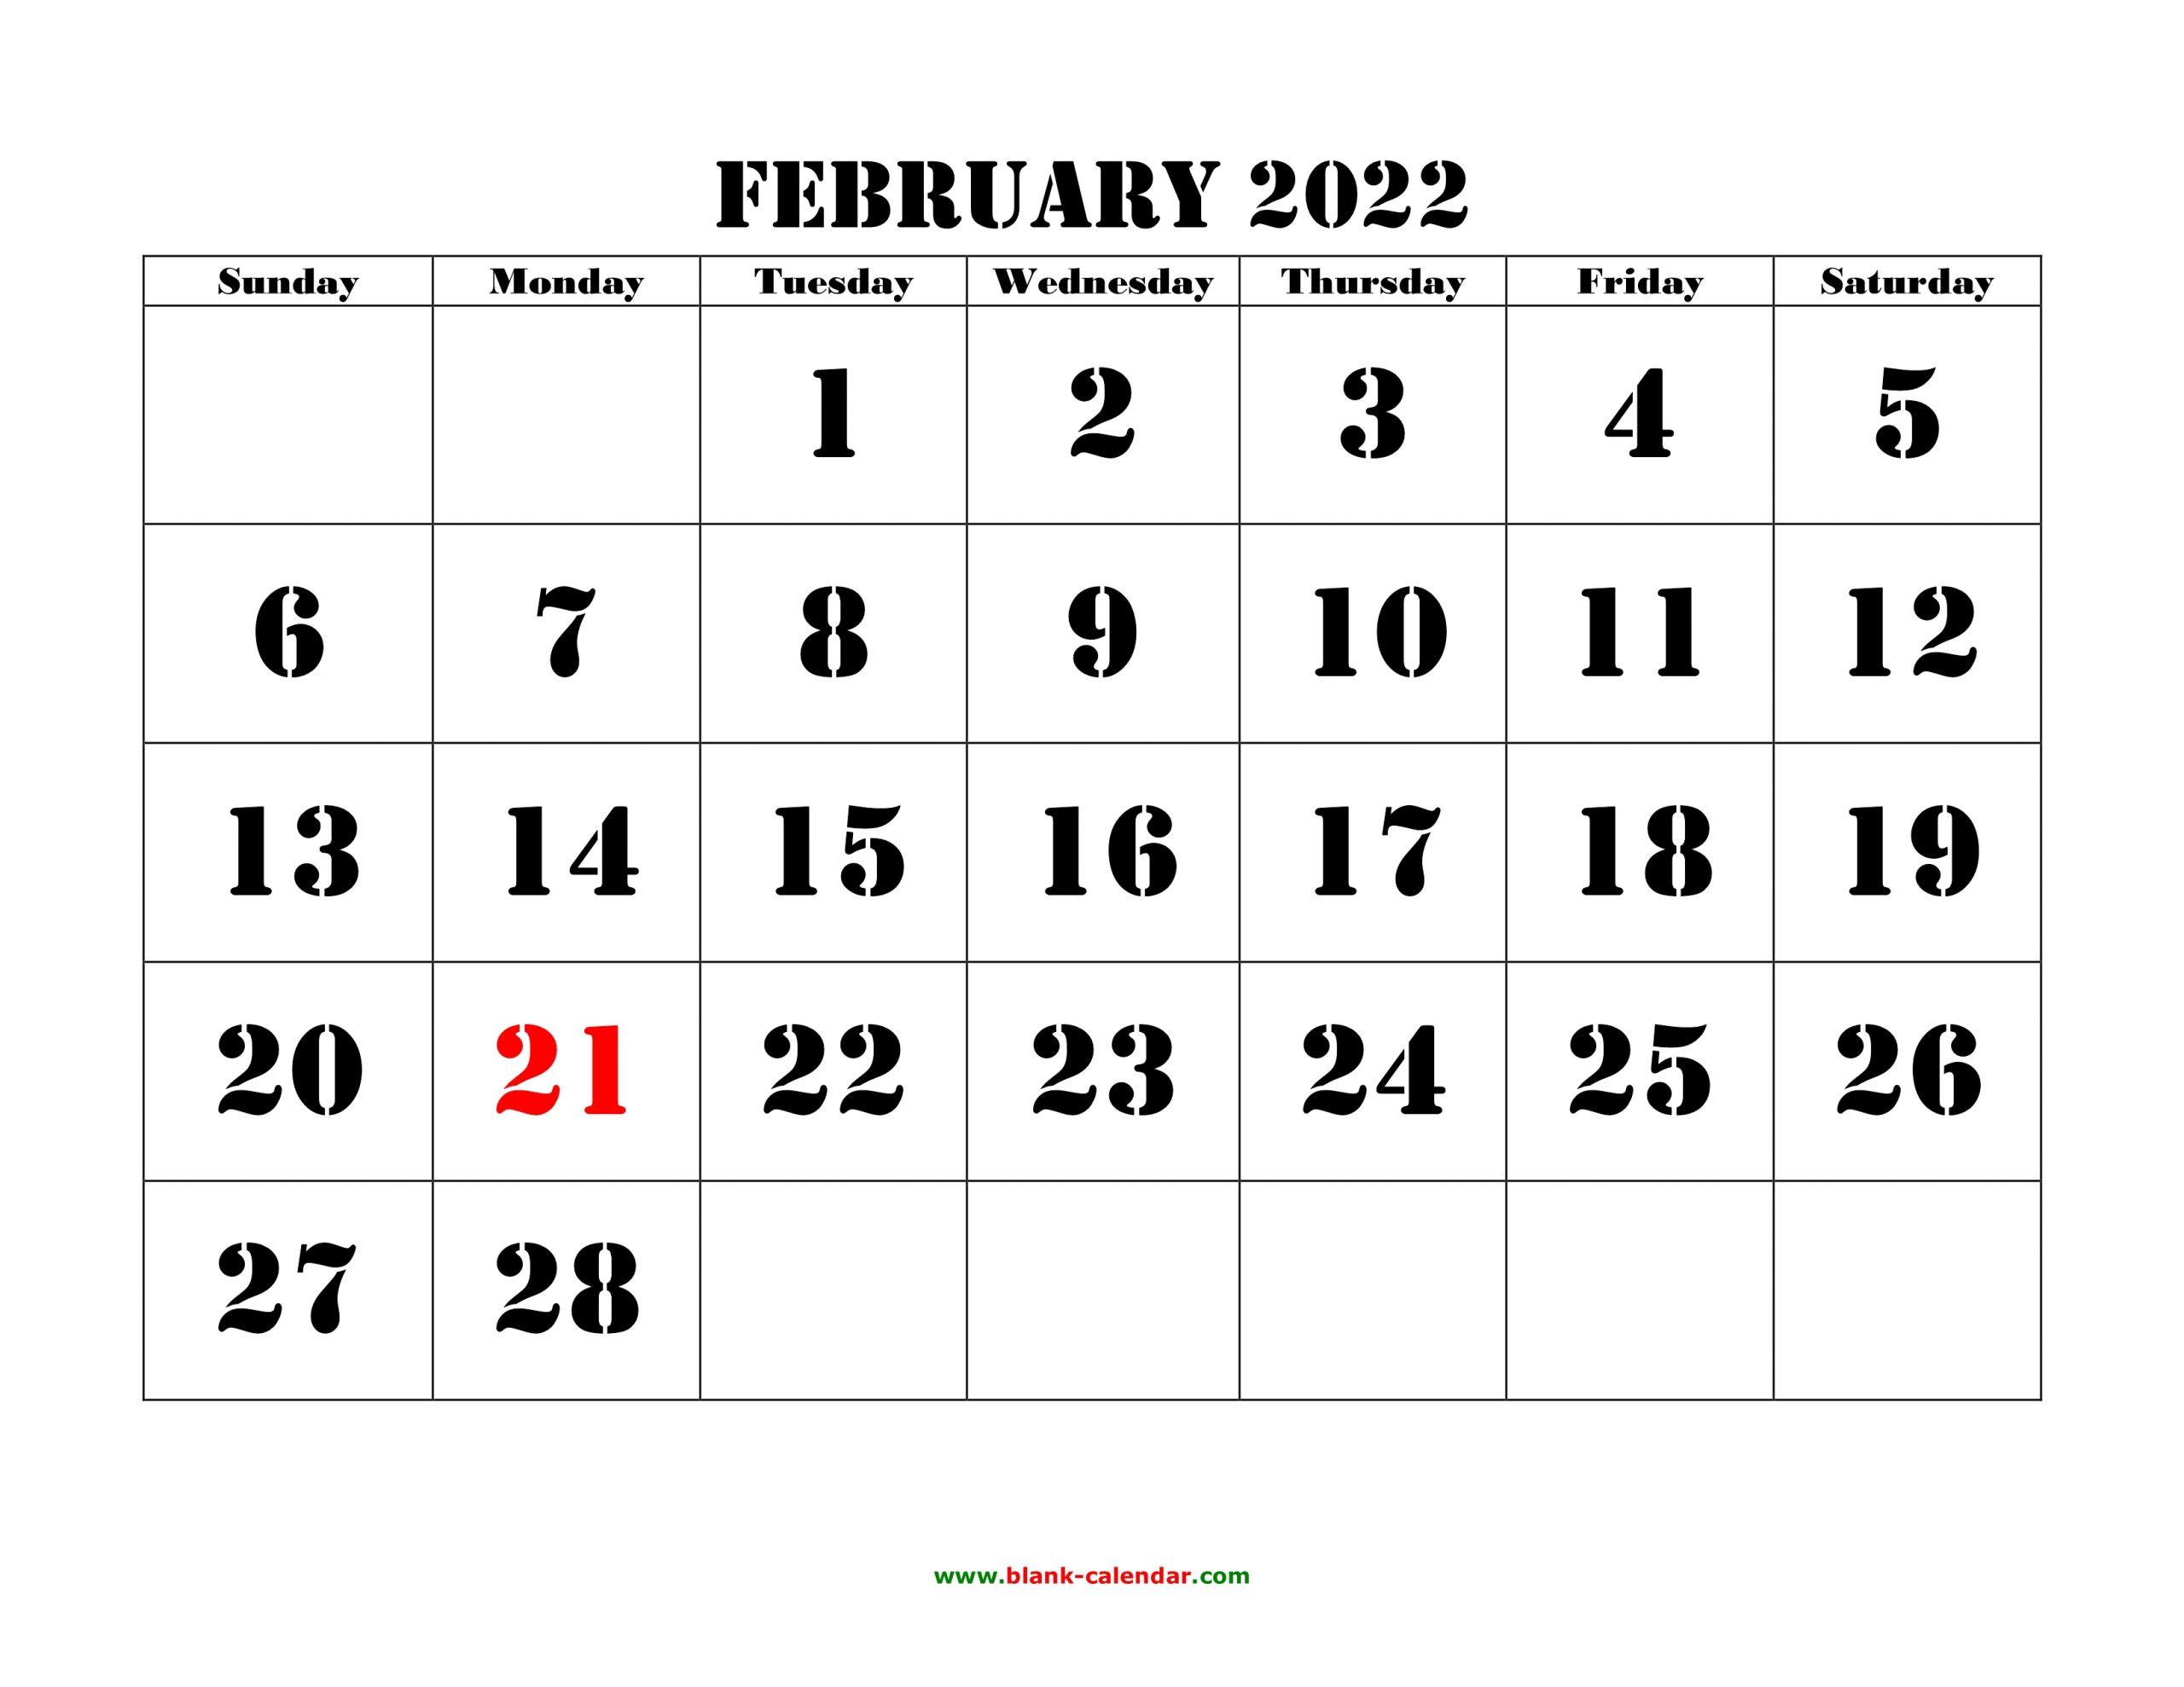 Free Download Printable February 2022 Calendar, Large Font Within February 2022 Calendar Printable